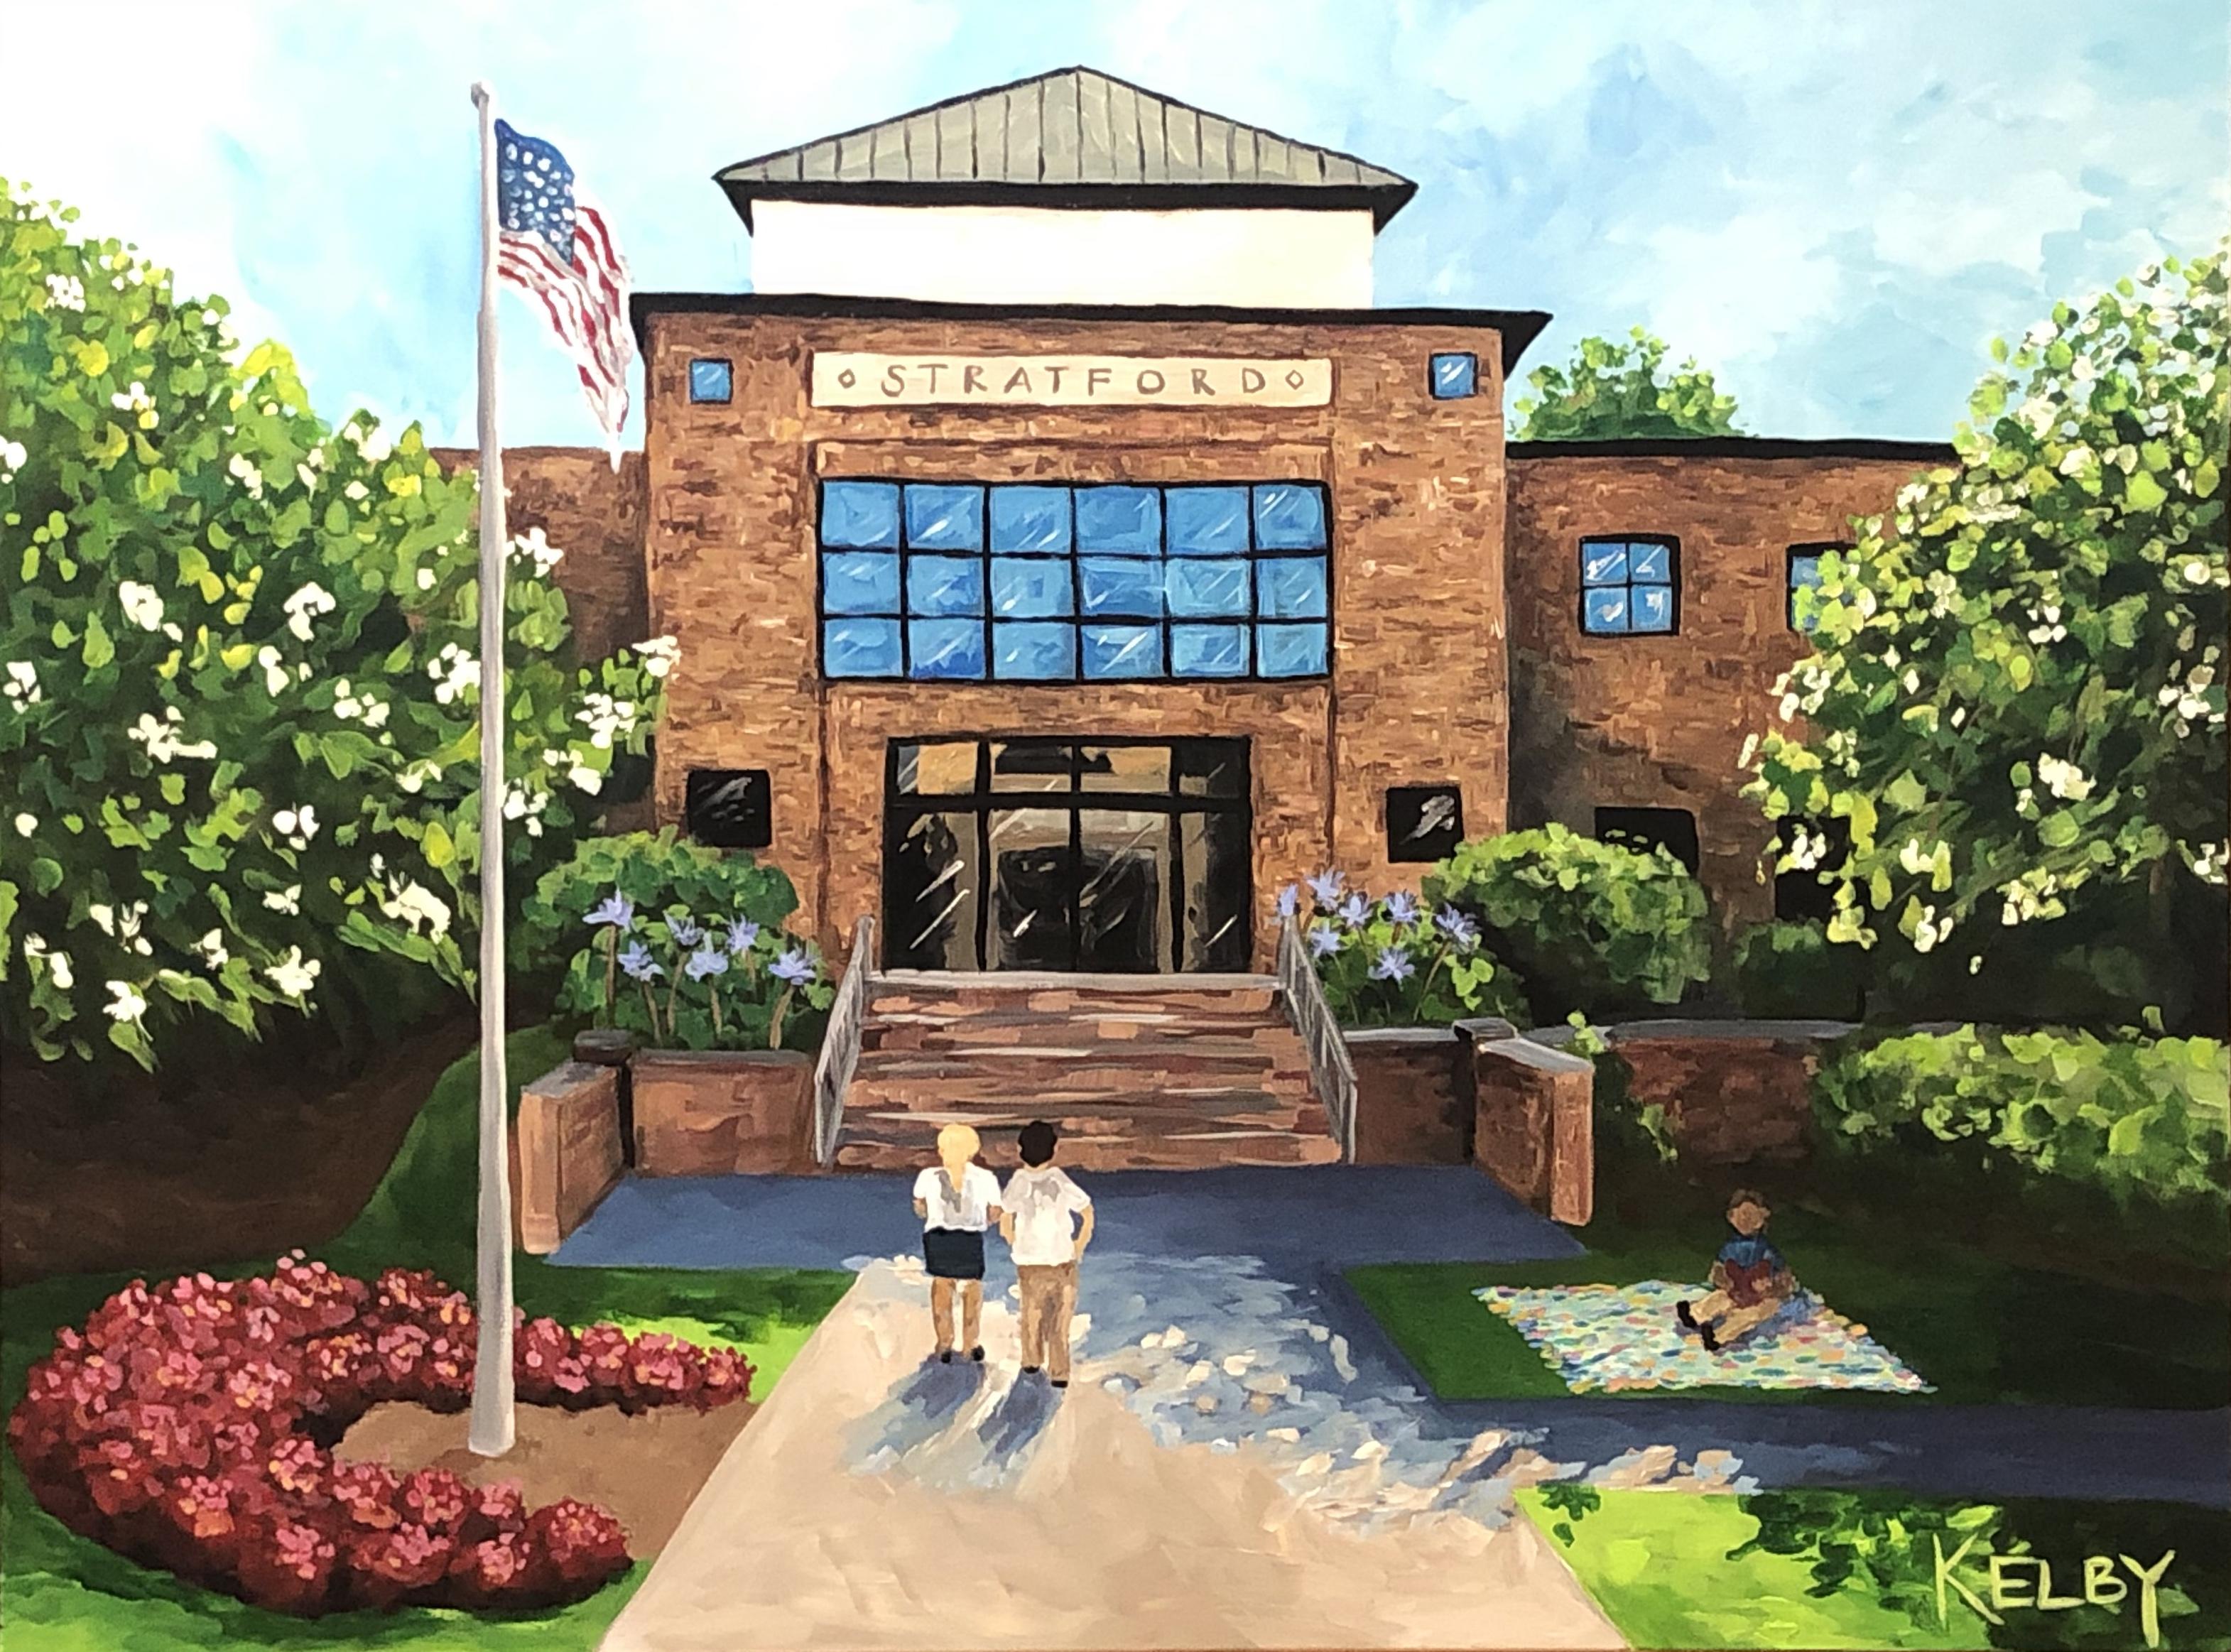 Stratford Academy Olson Library